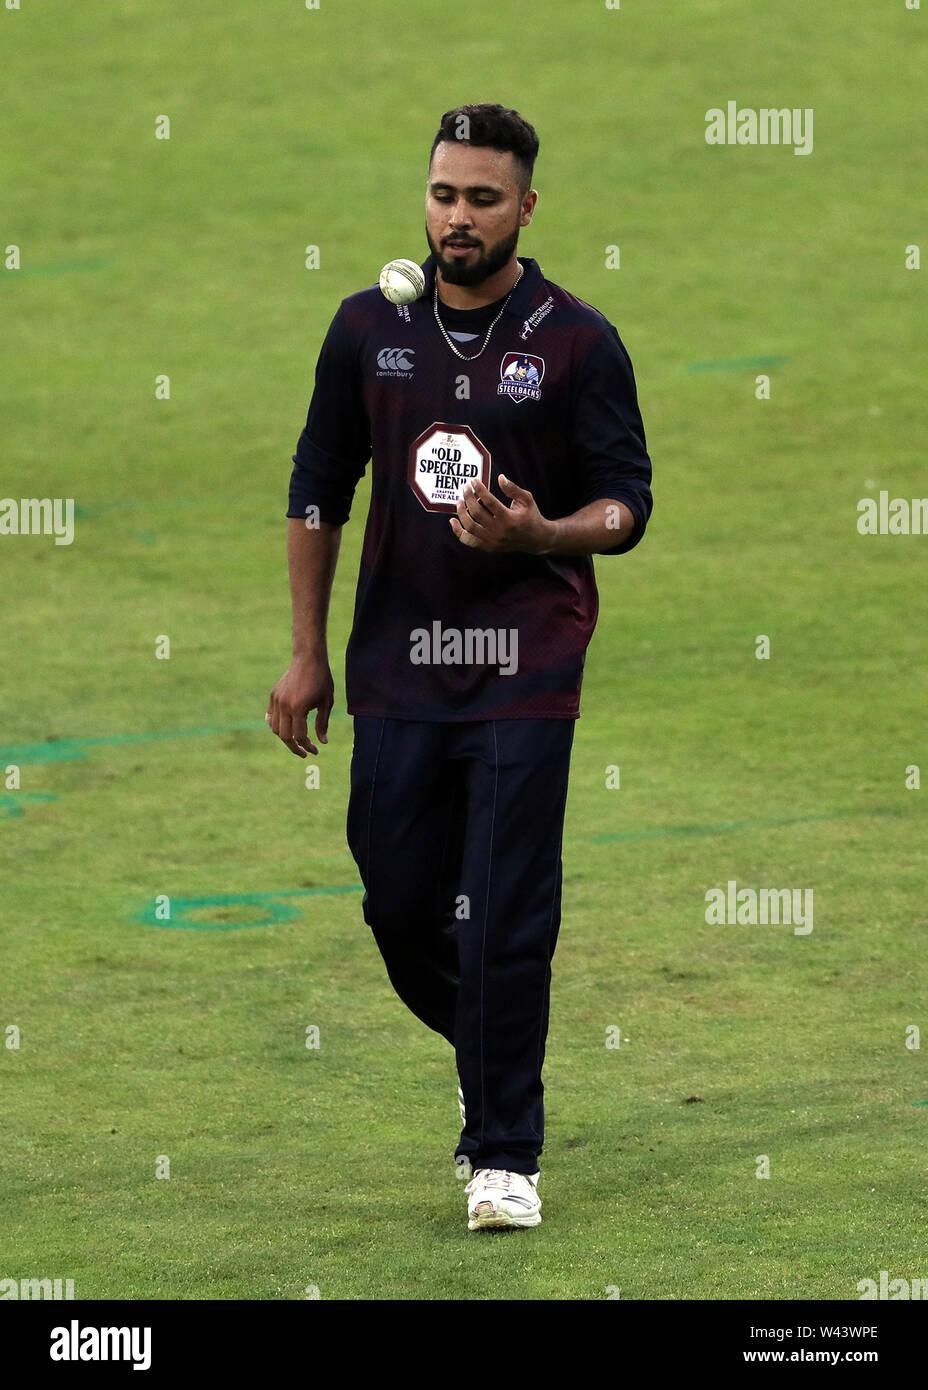 Northamptonshire's Faheem Ashraf during the Vitality Blast T20 match at Emirates Riverside, Durham. - Stock Image